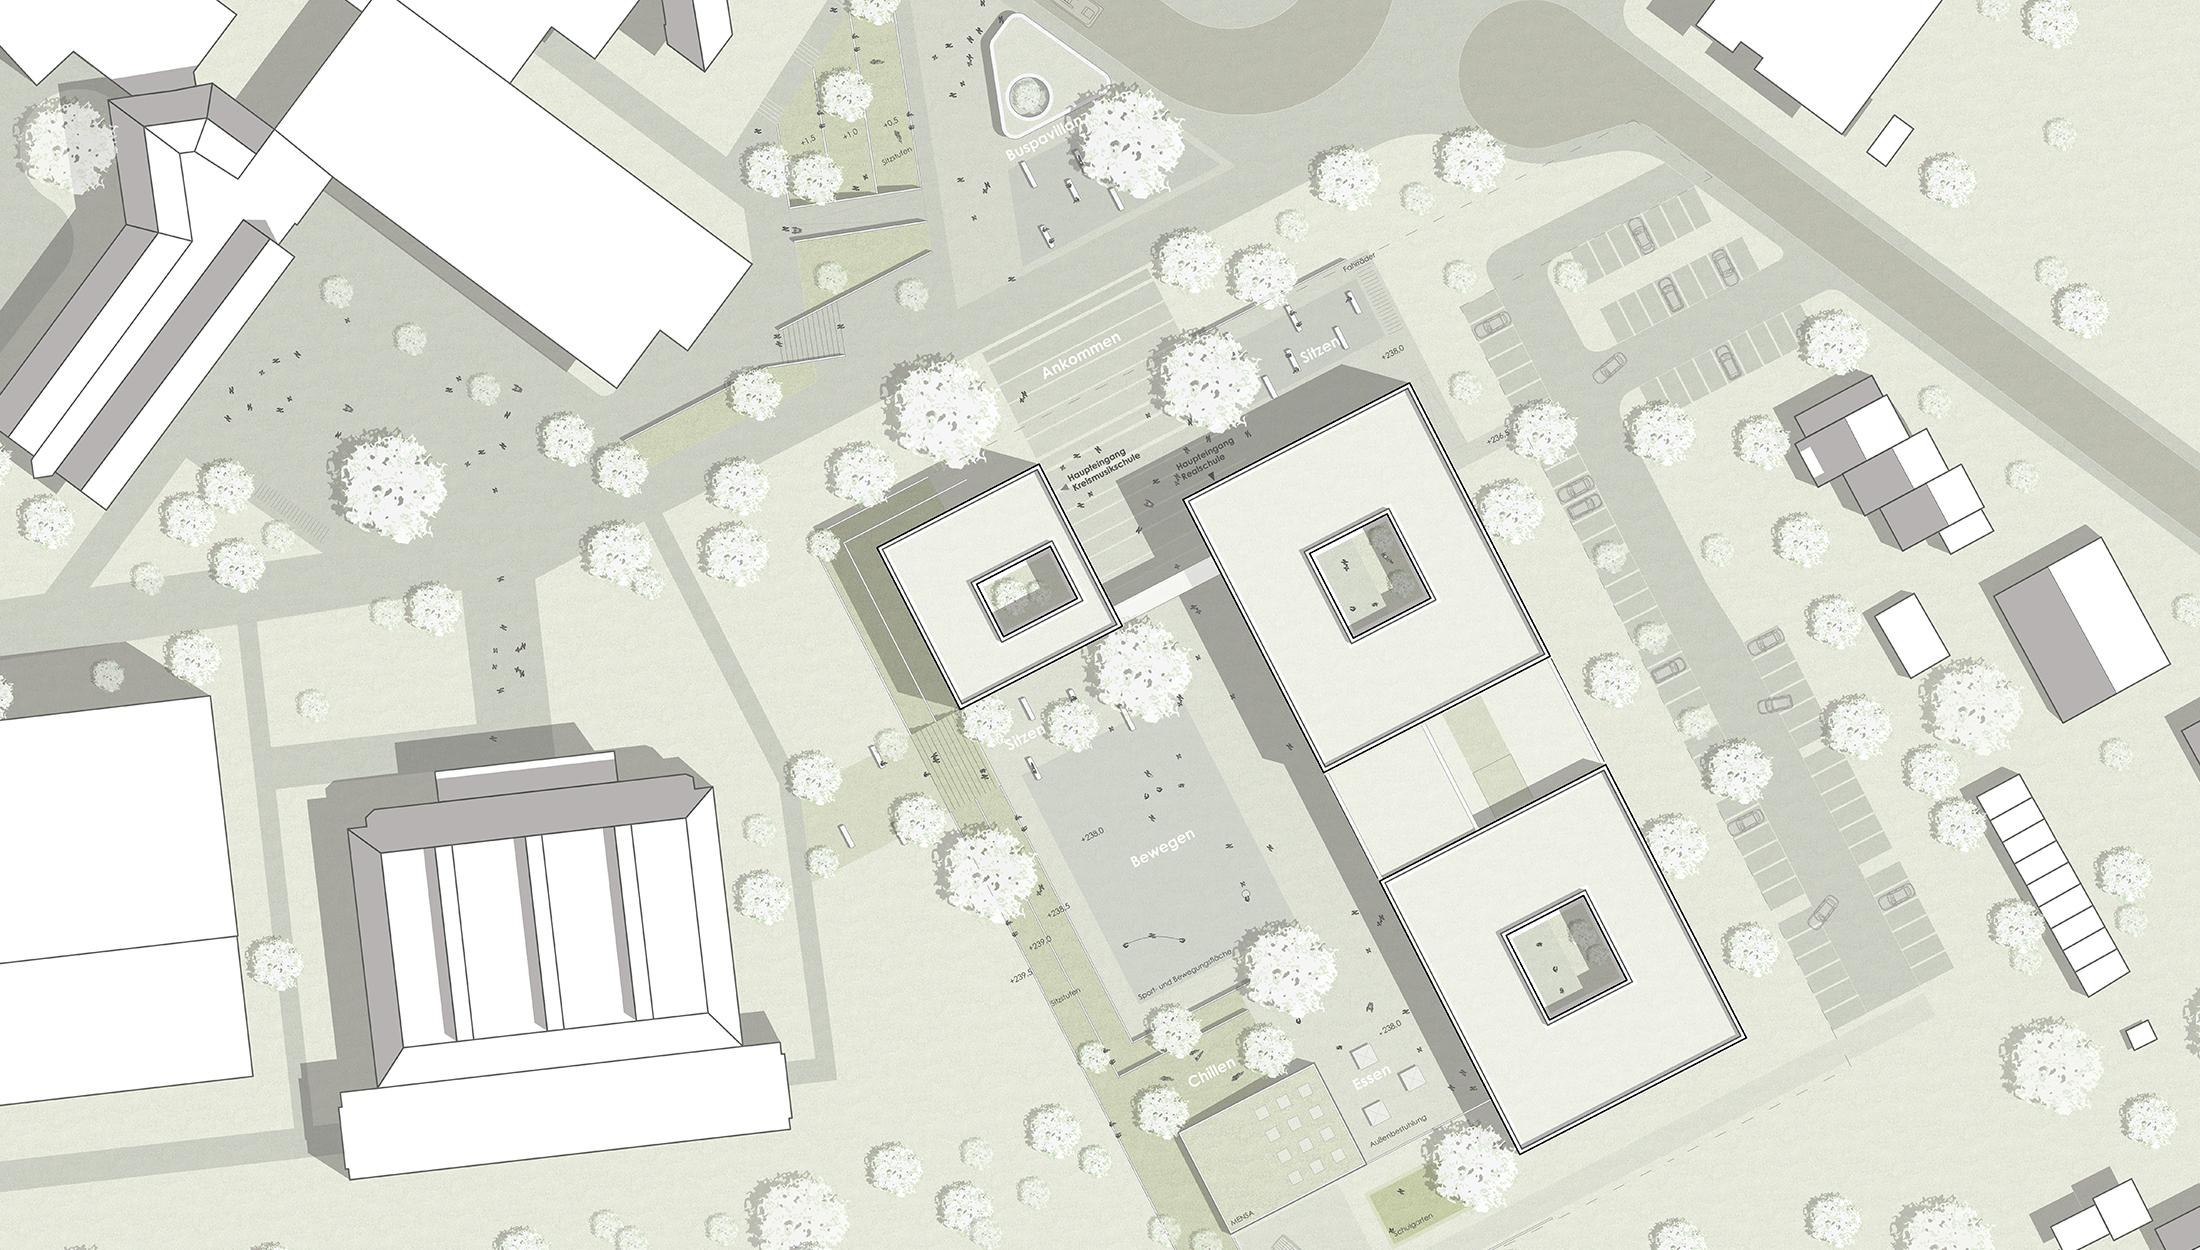 2019, Anne-Frank-Realschule plus, Montabaur